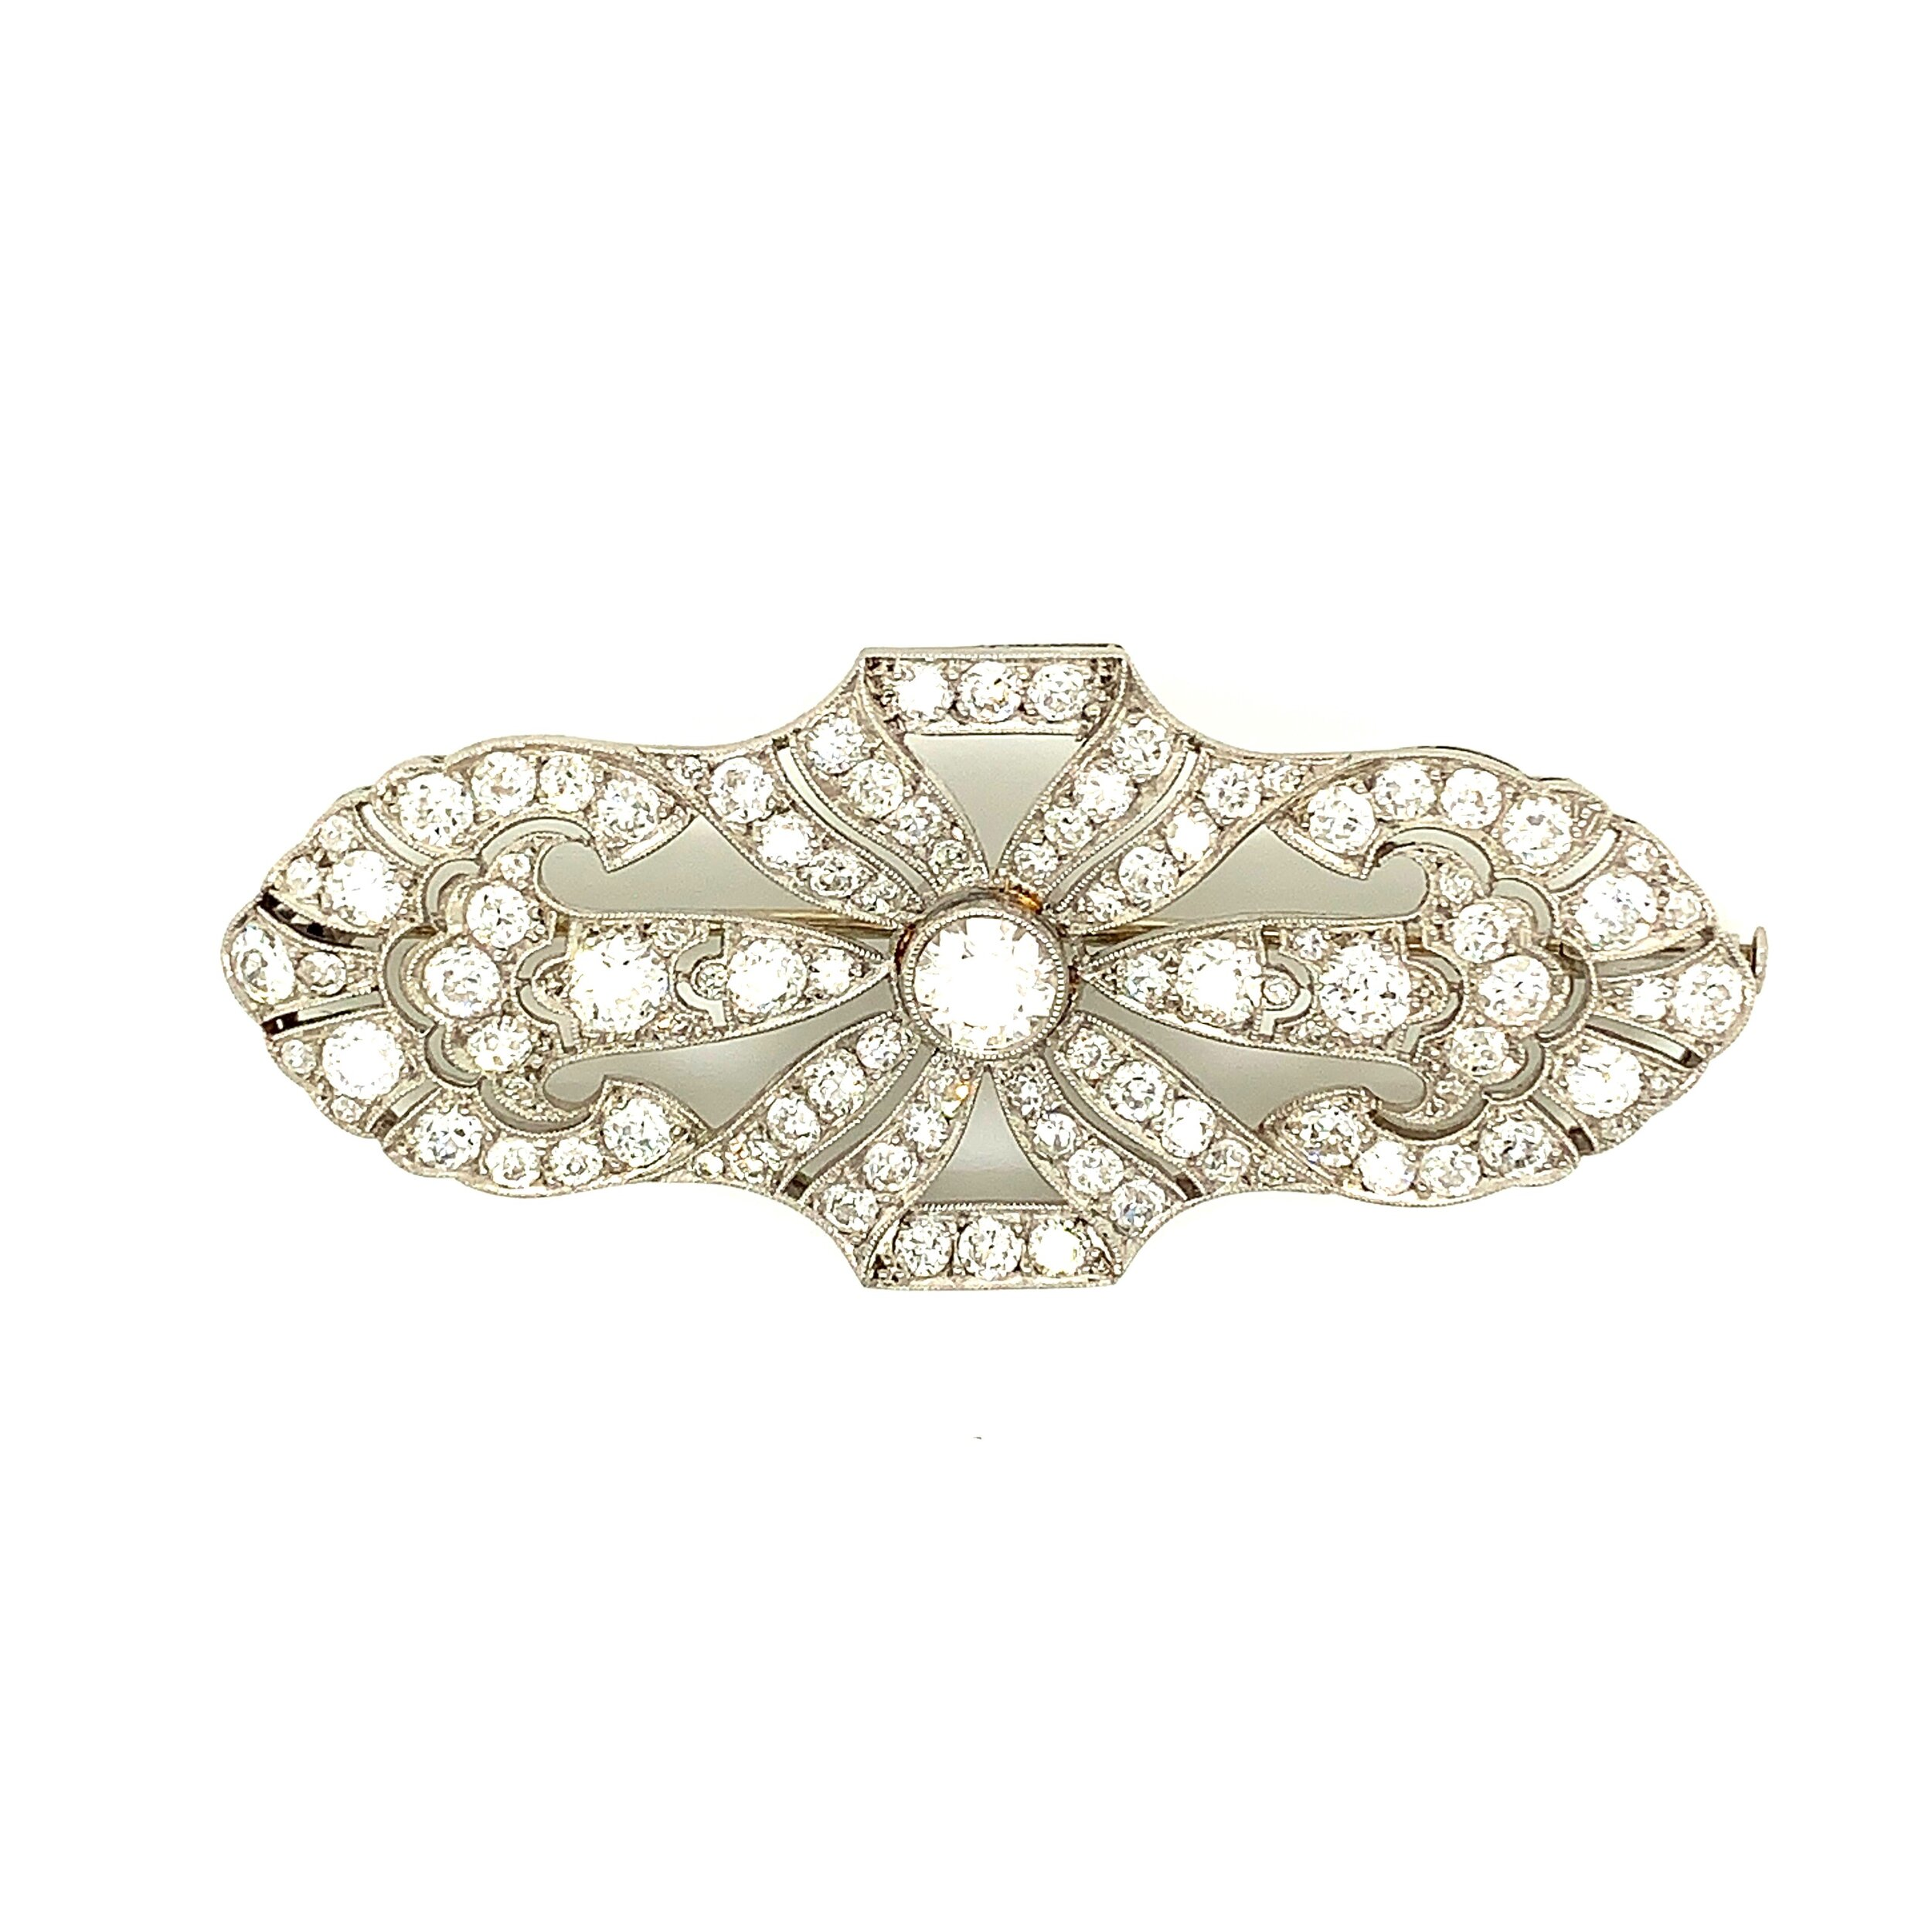 4.8ct Diamond French Deco Brooch set in Platinum  Est. US$ 2,500-3,000